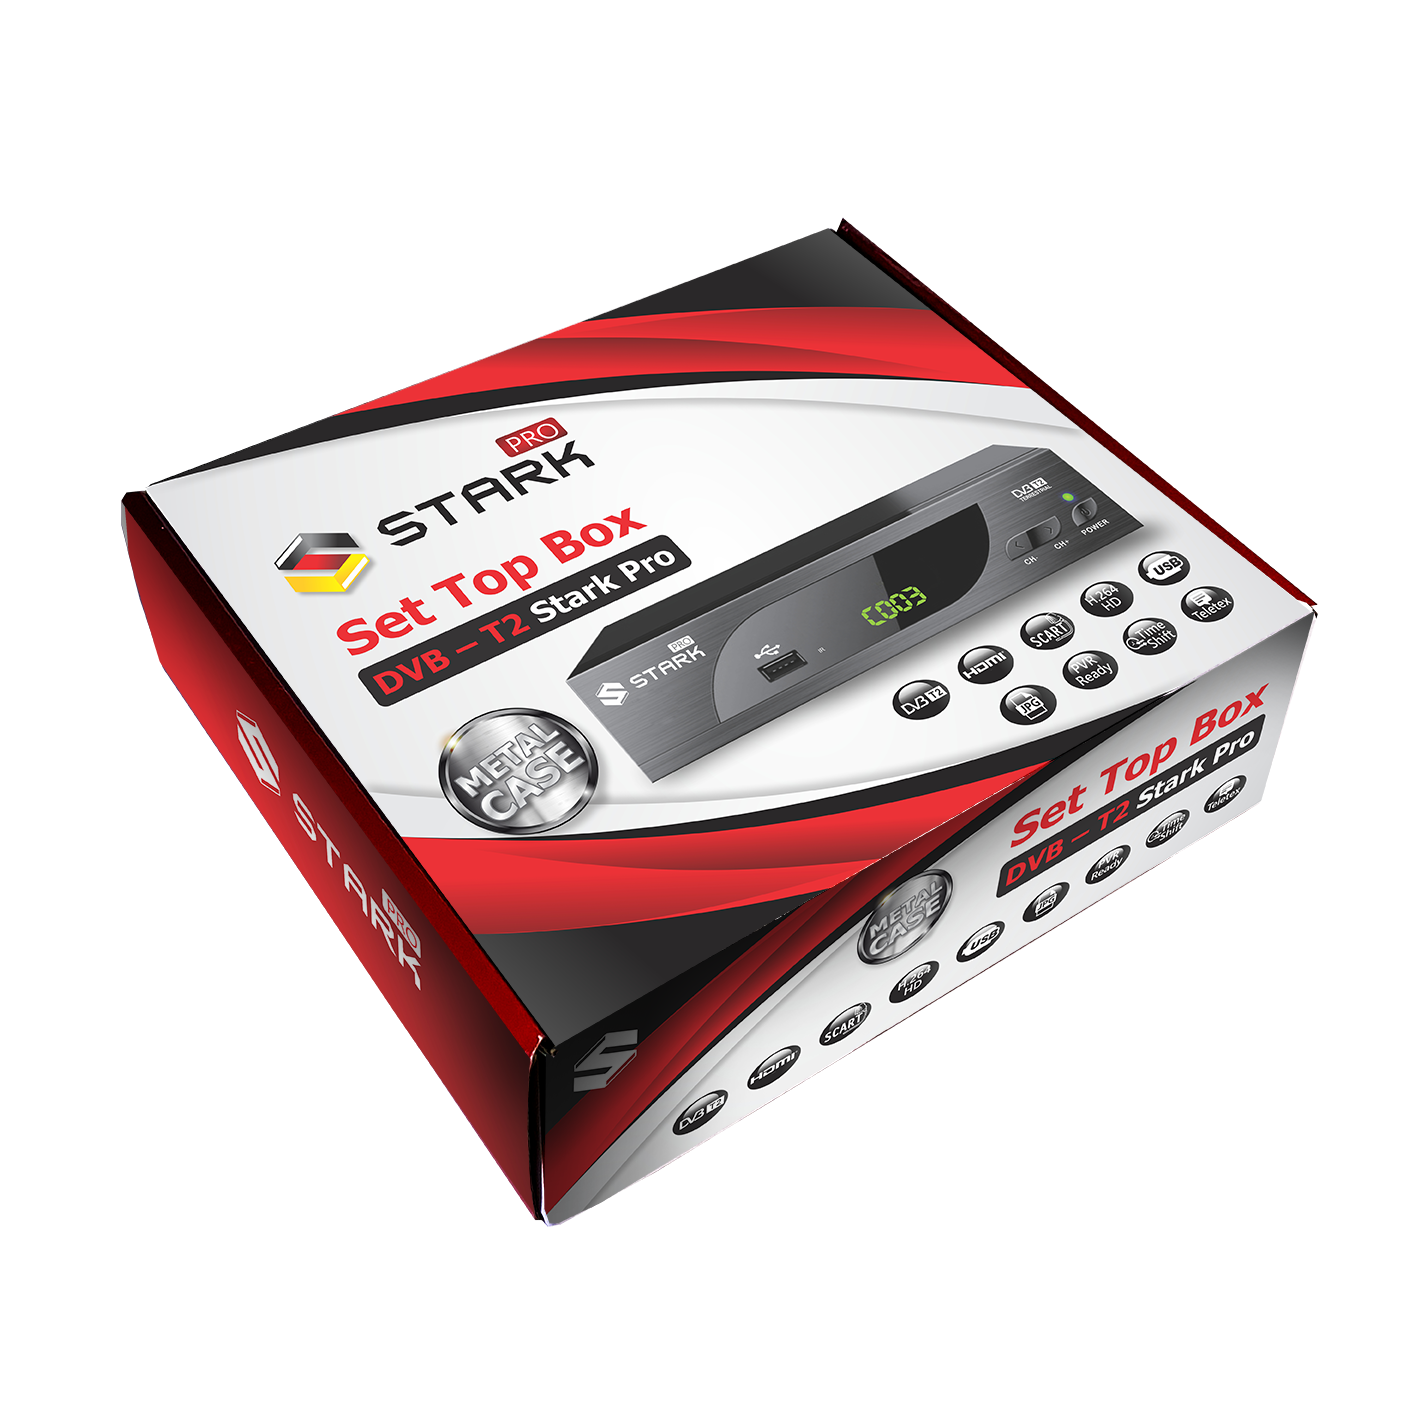 STARK PRO Set Top Box DVB-T2 PVR, teletex, metalno kućište